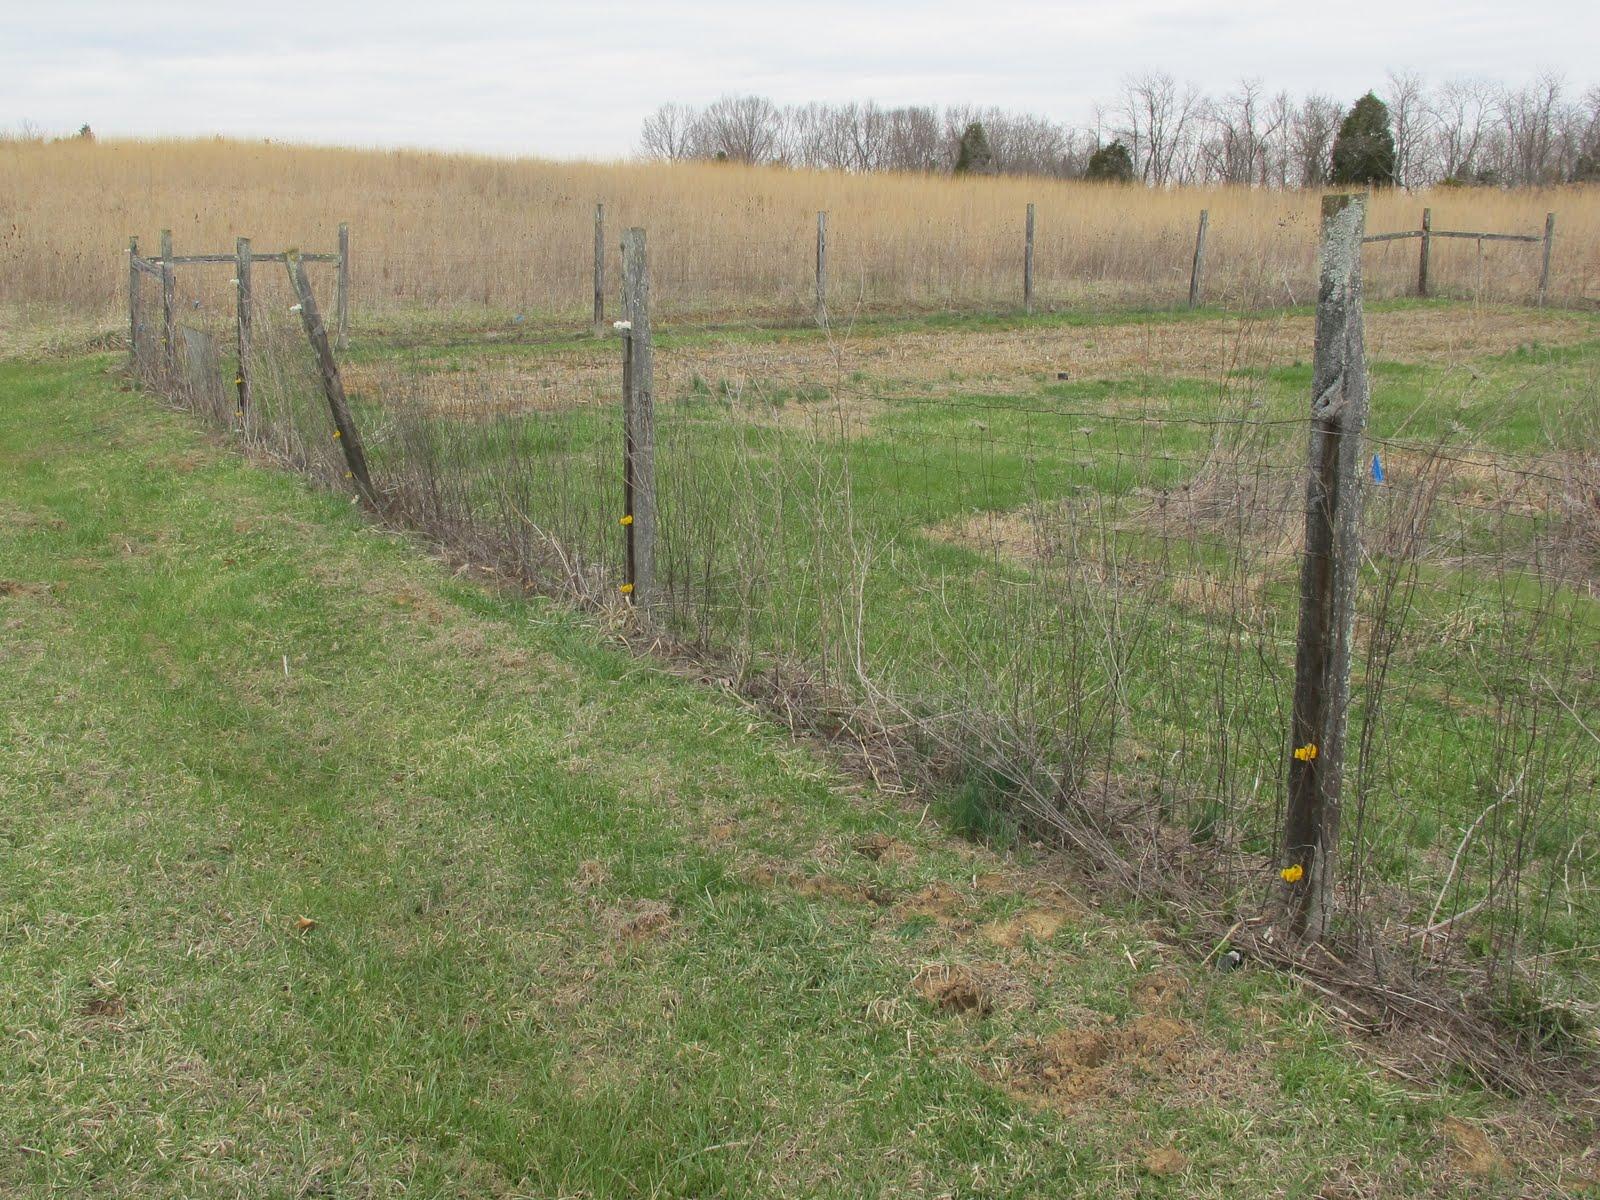 Blue jay barrens a new garden fence a new garden fence baanklon Image collections